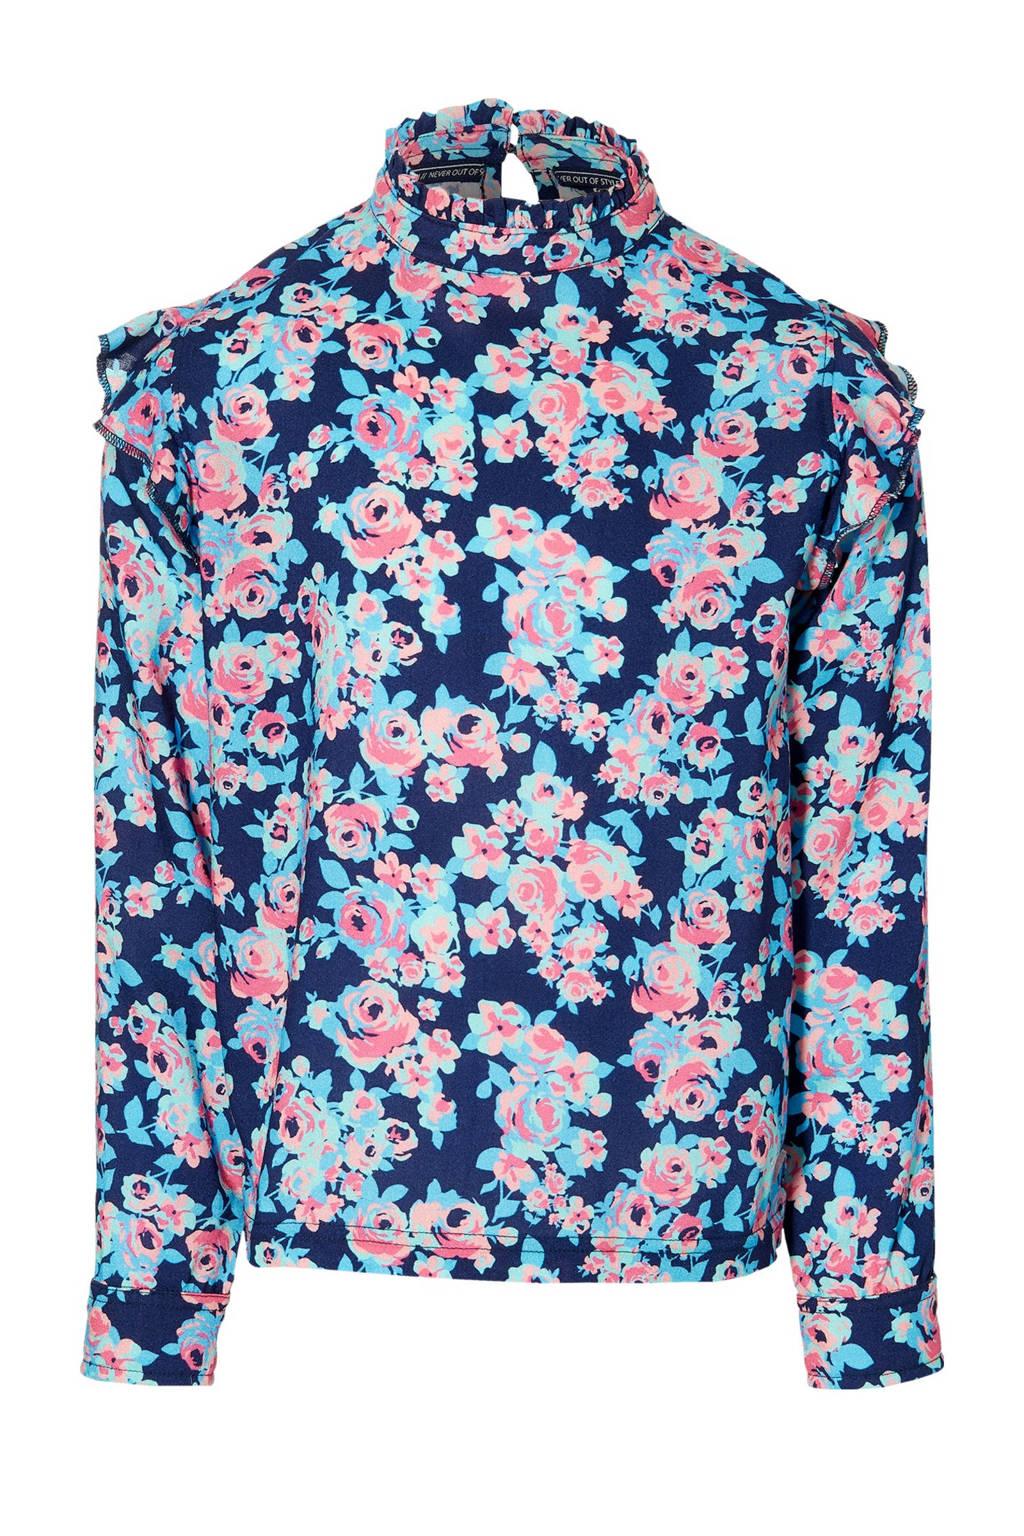 Quapi Girls gebloemde top Fian donkerblauw/roze/lichtblauw, Donkerblauw/roze/lichtblauw